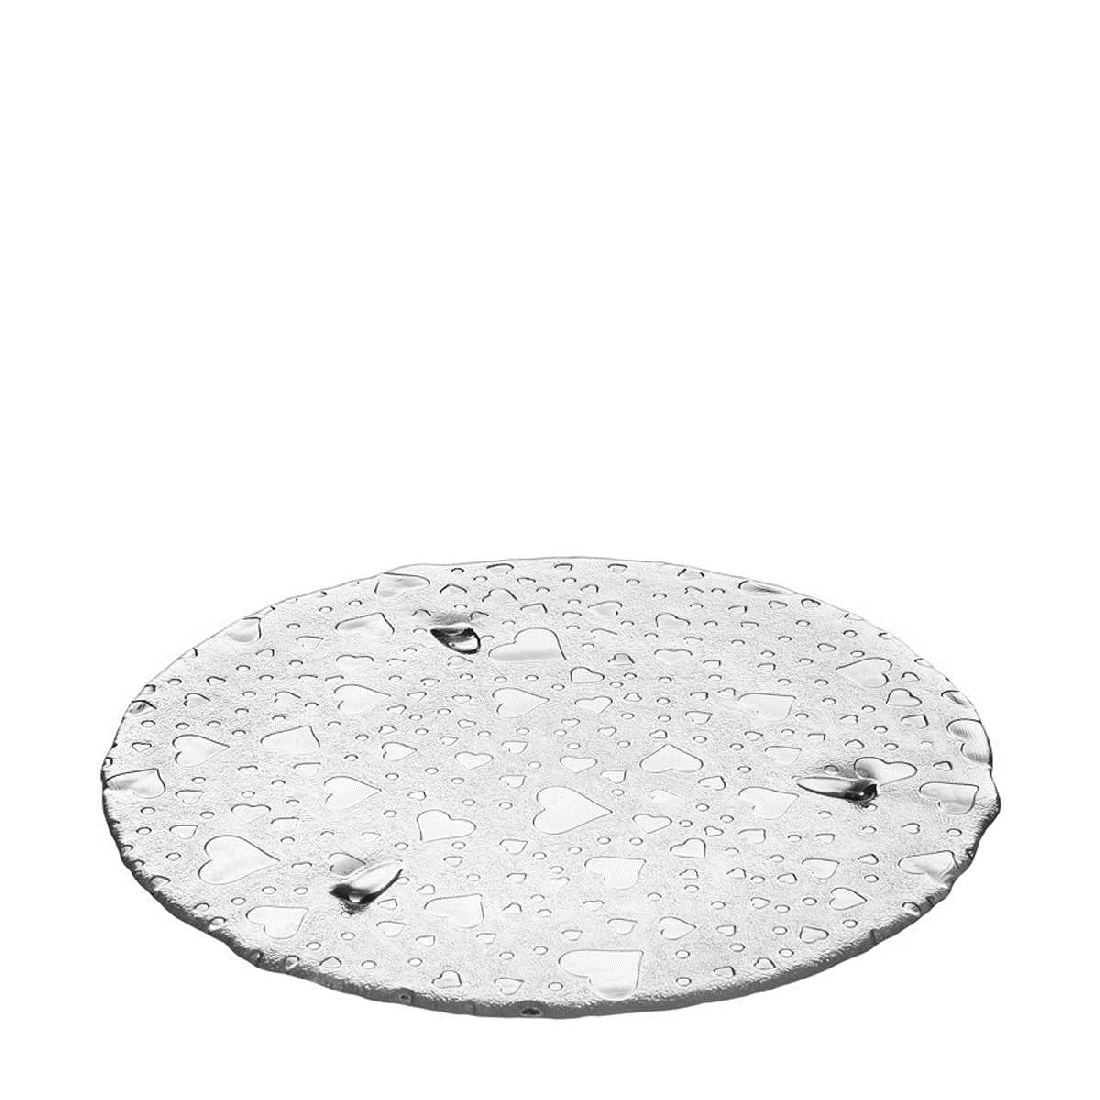 Tortenplatte Heart - 34 cm, Leonardo